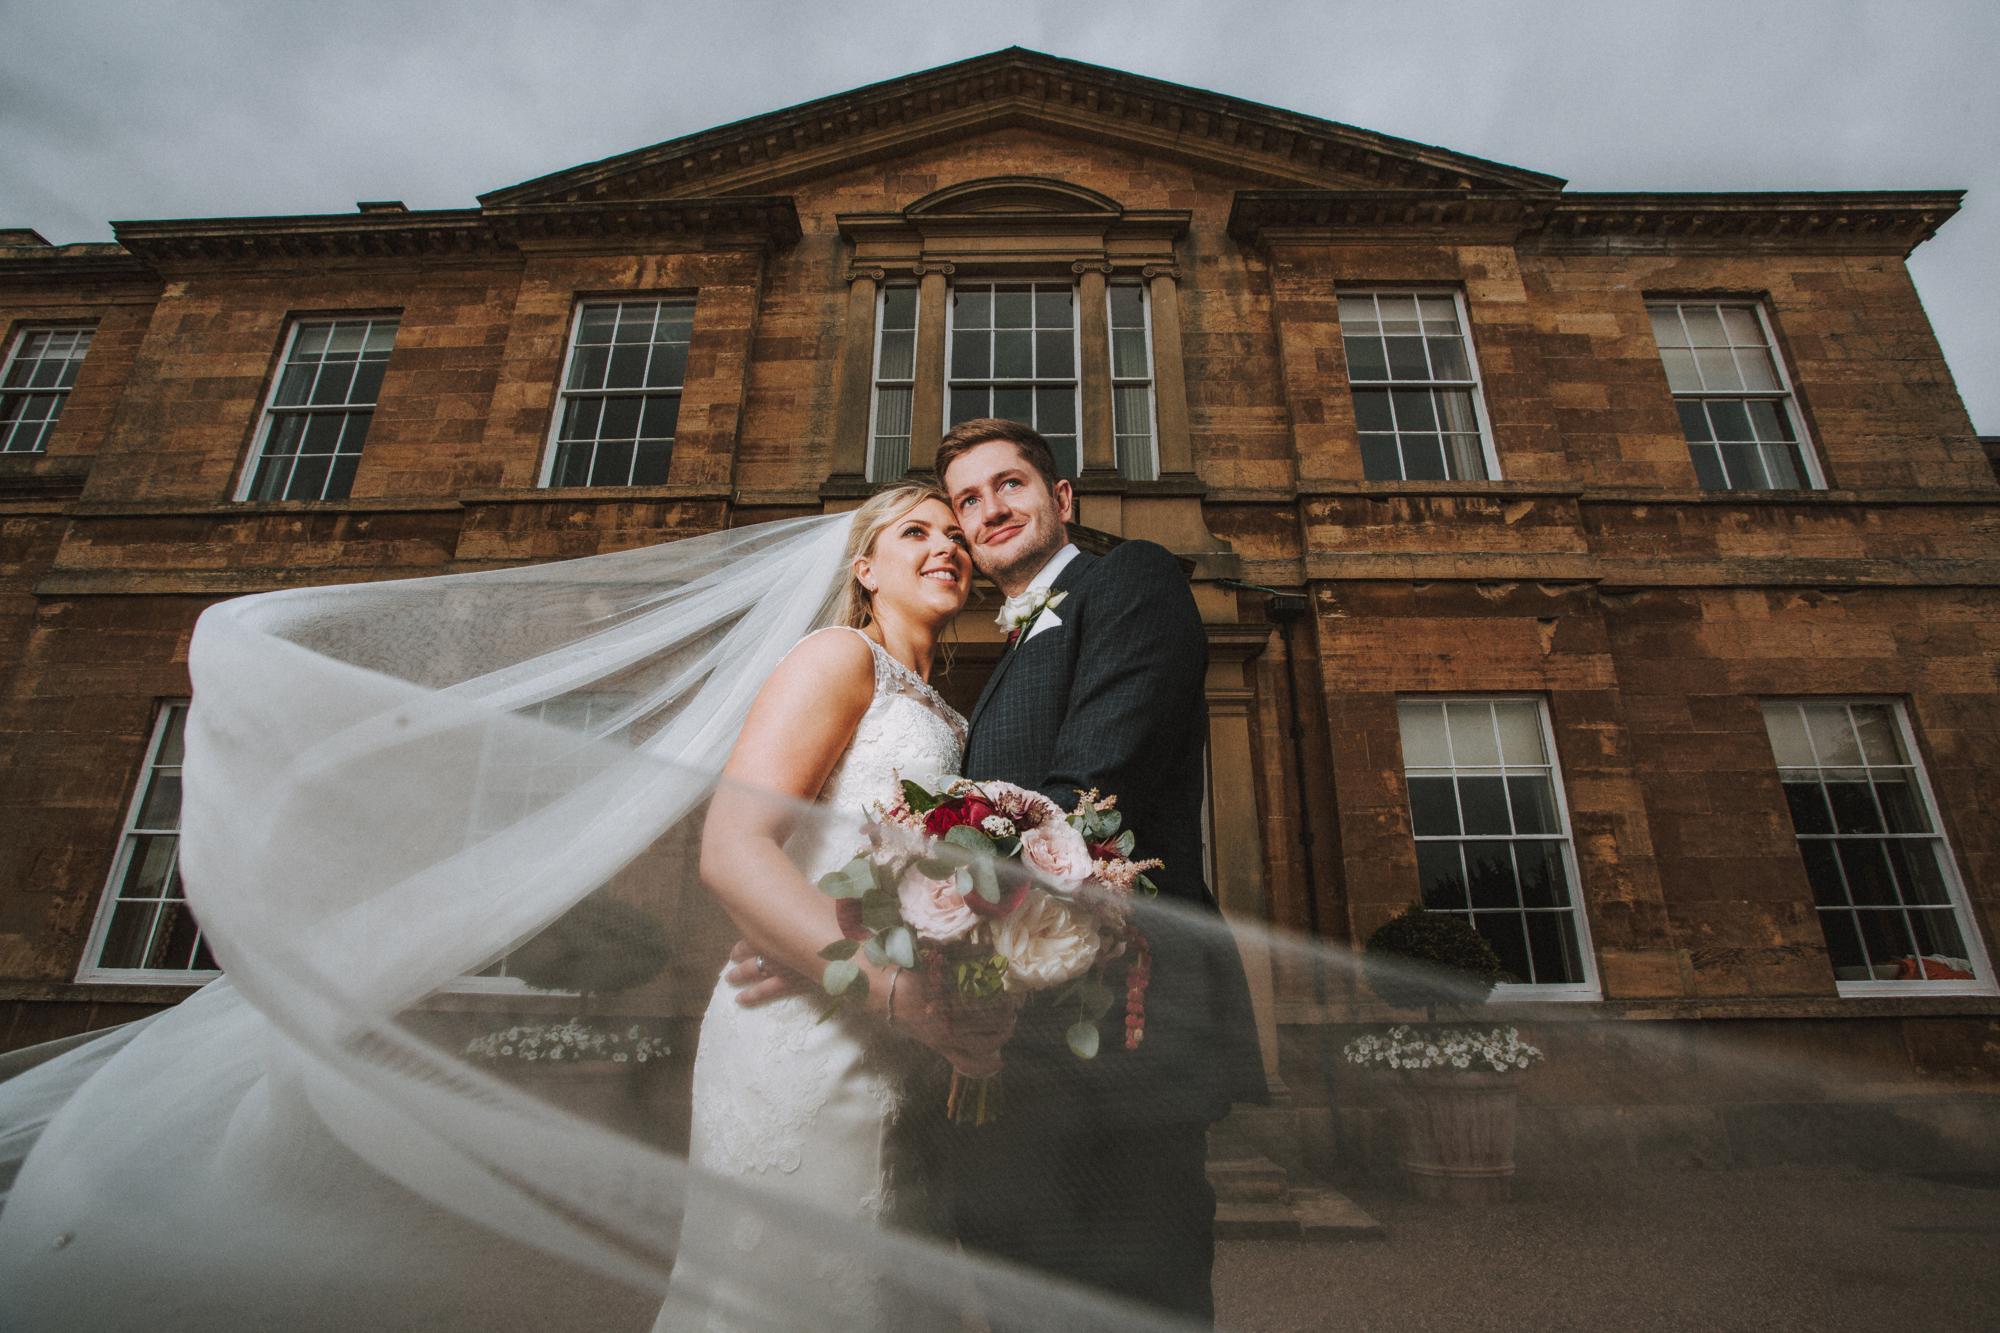 bowcliffe hall wedding photographers yorkshire-39.jpg